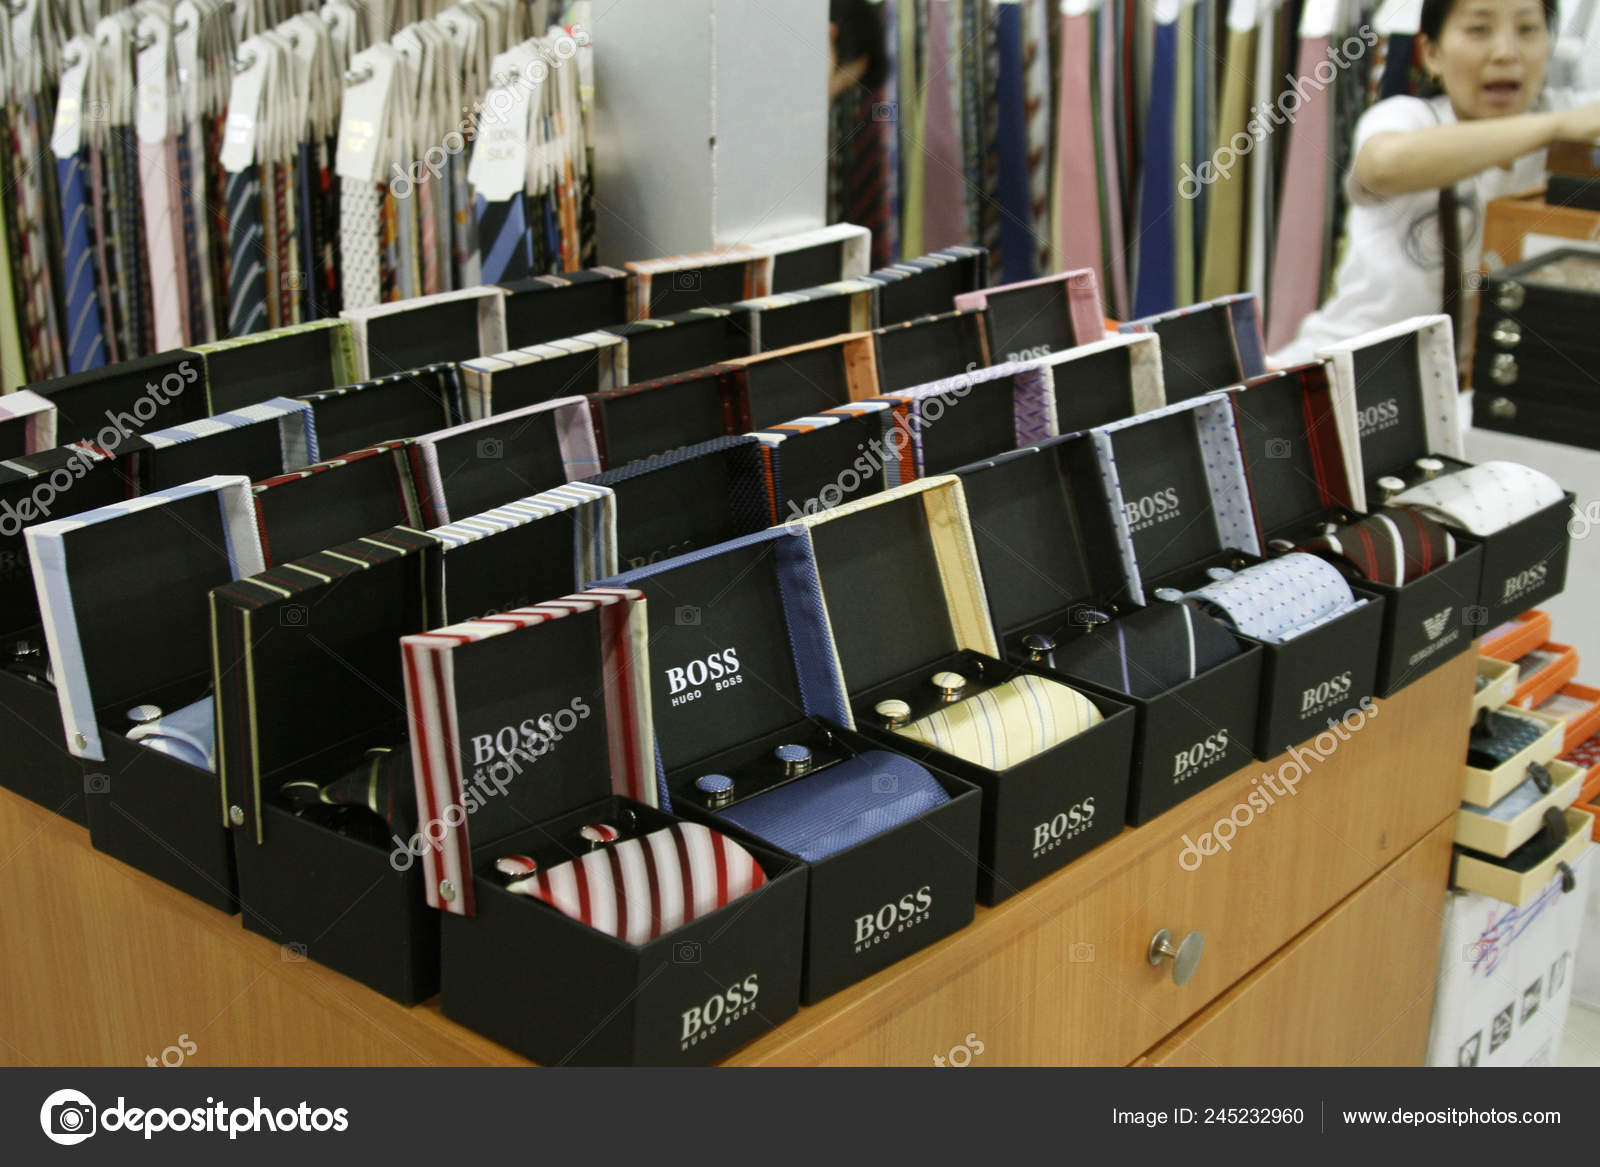 boss ties sale